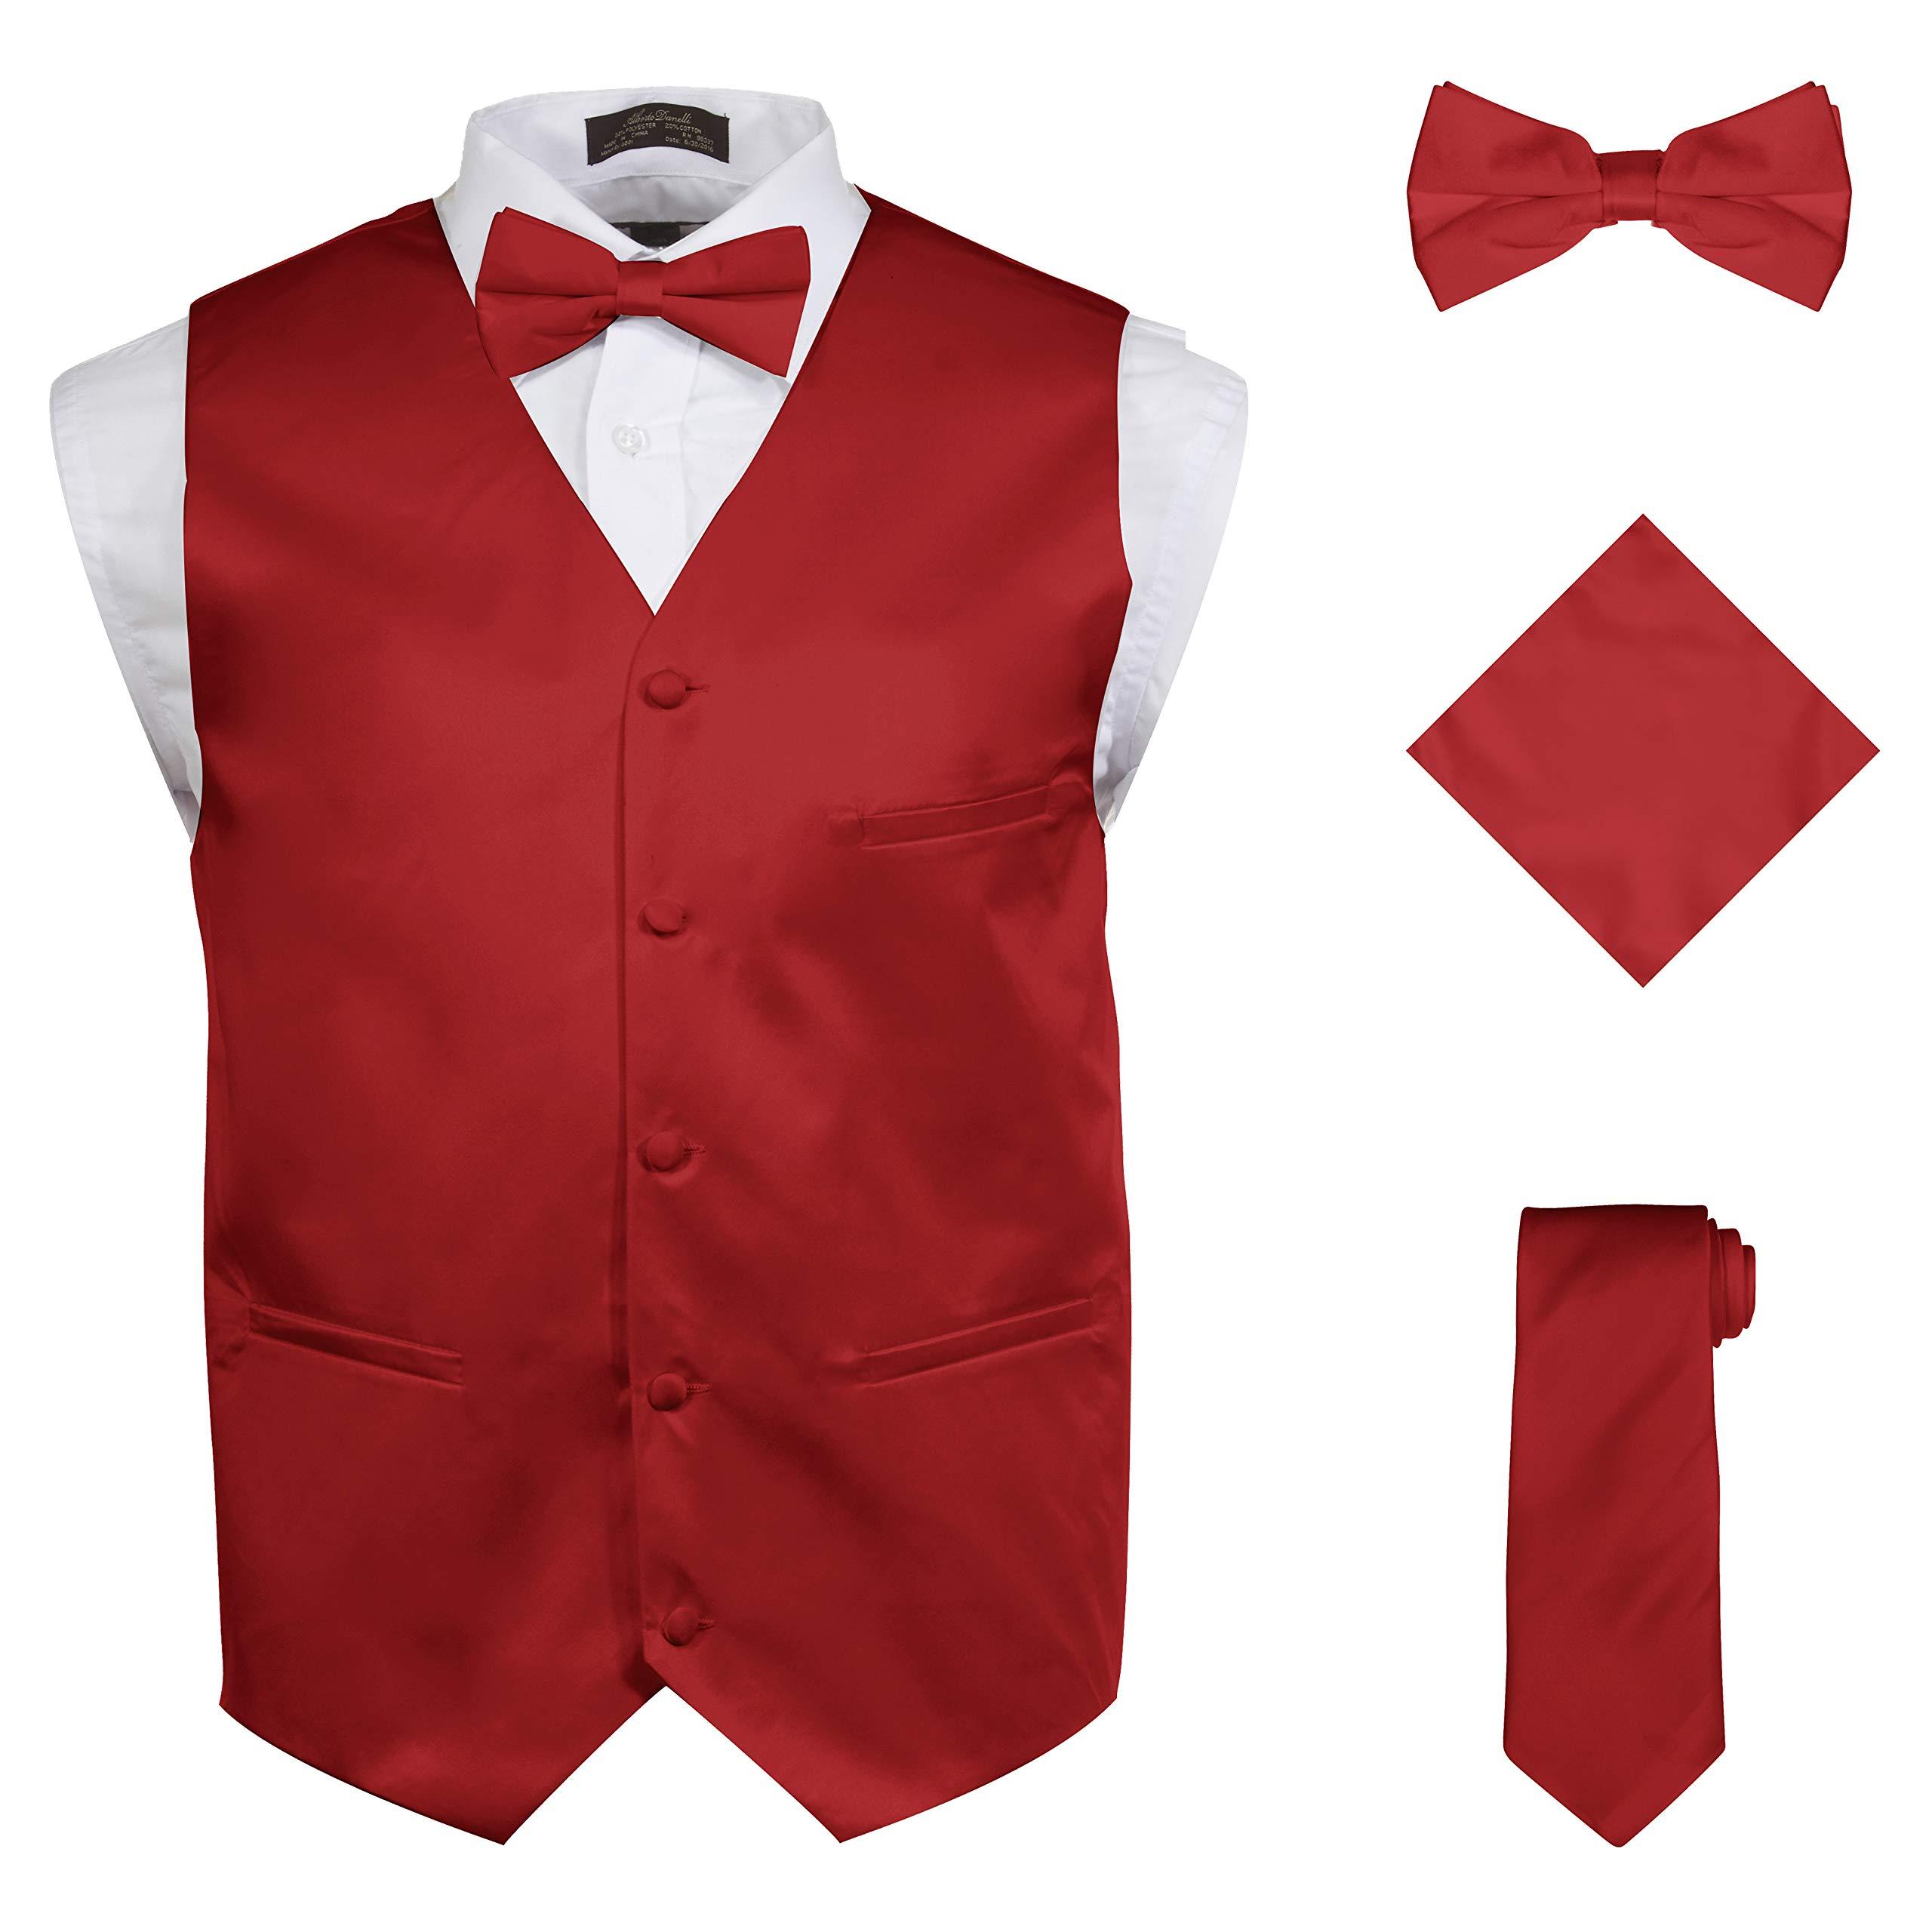 Vittorino Vittorino's Mens 4 Piece Formal Vest Set Combo With Tie Bow Tie and Handkerchief, Red, Medium